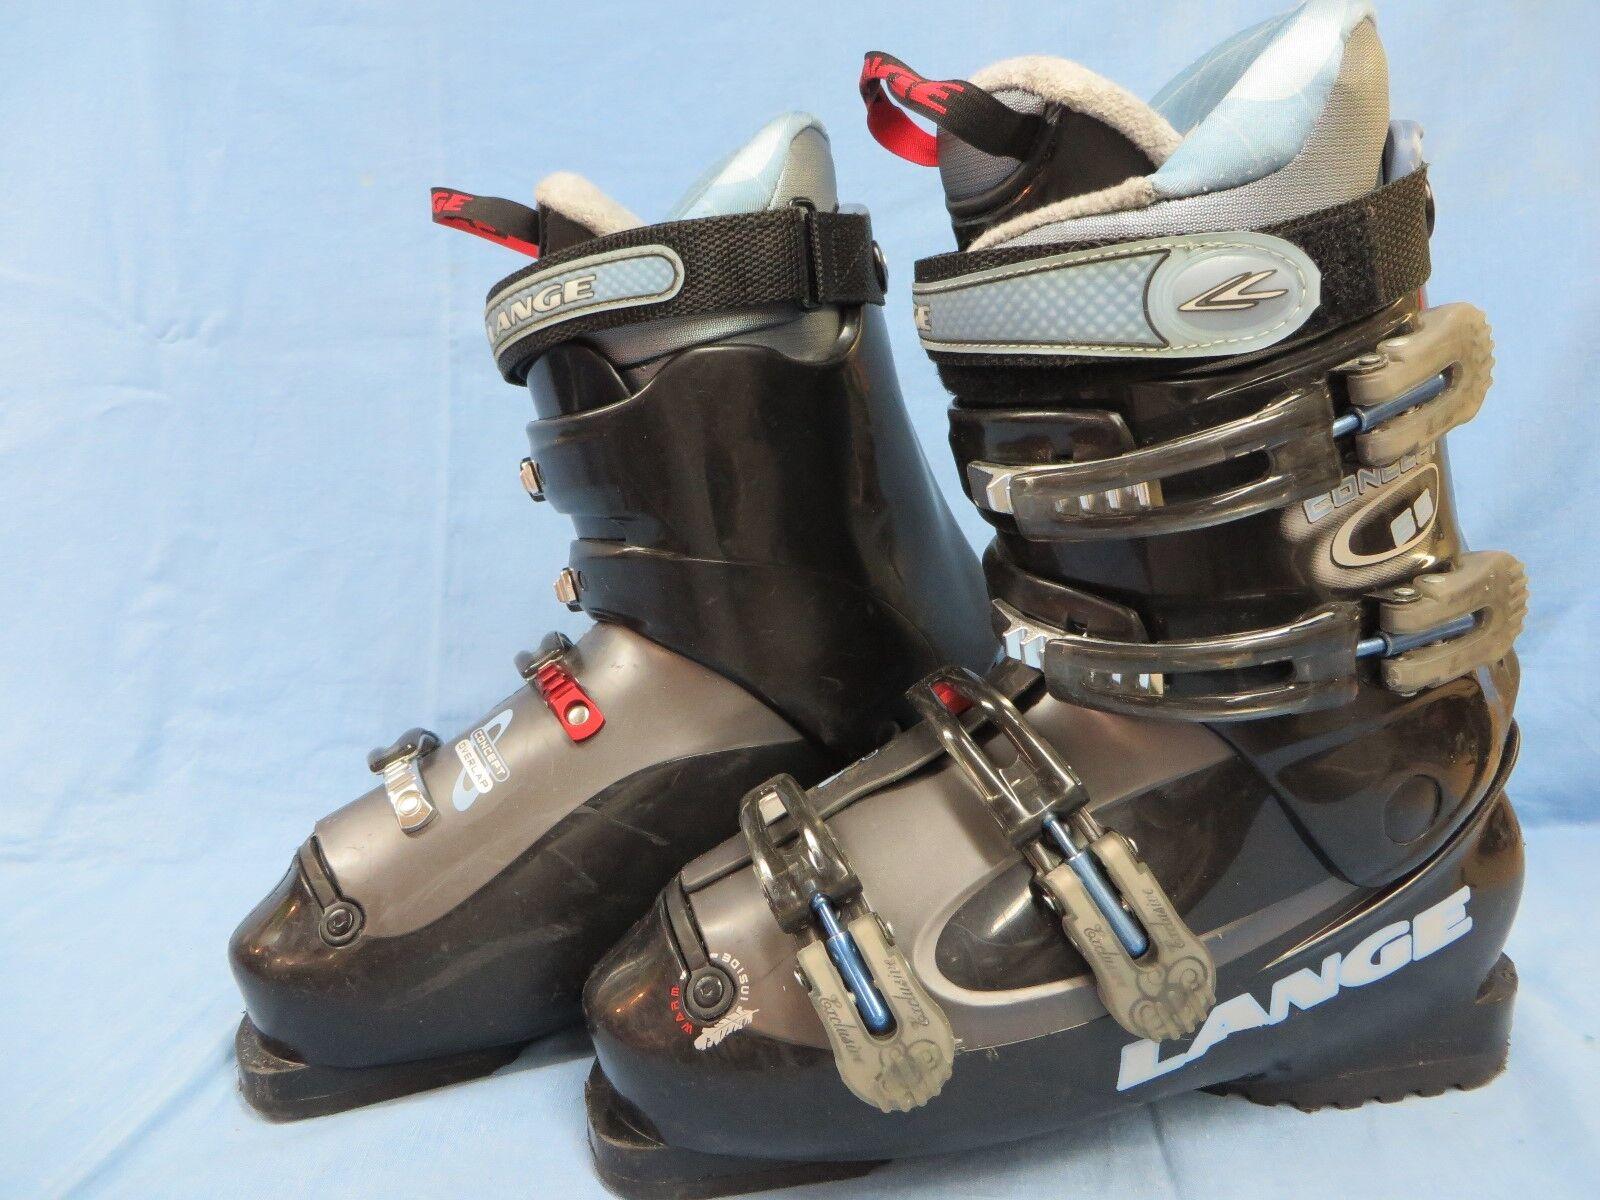 Lange Concept 65 damen Ski Stiefel 26.0 26.5 Used Used Used eac413